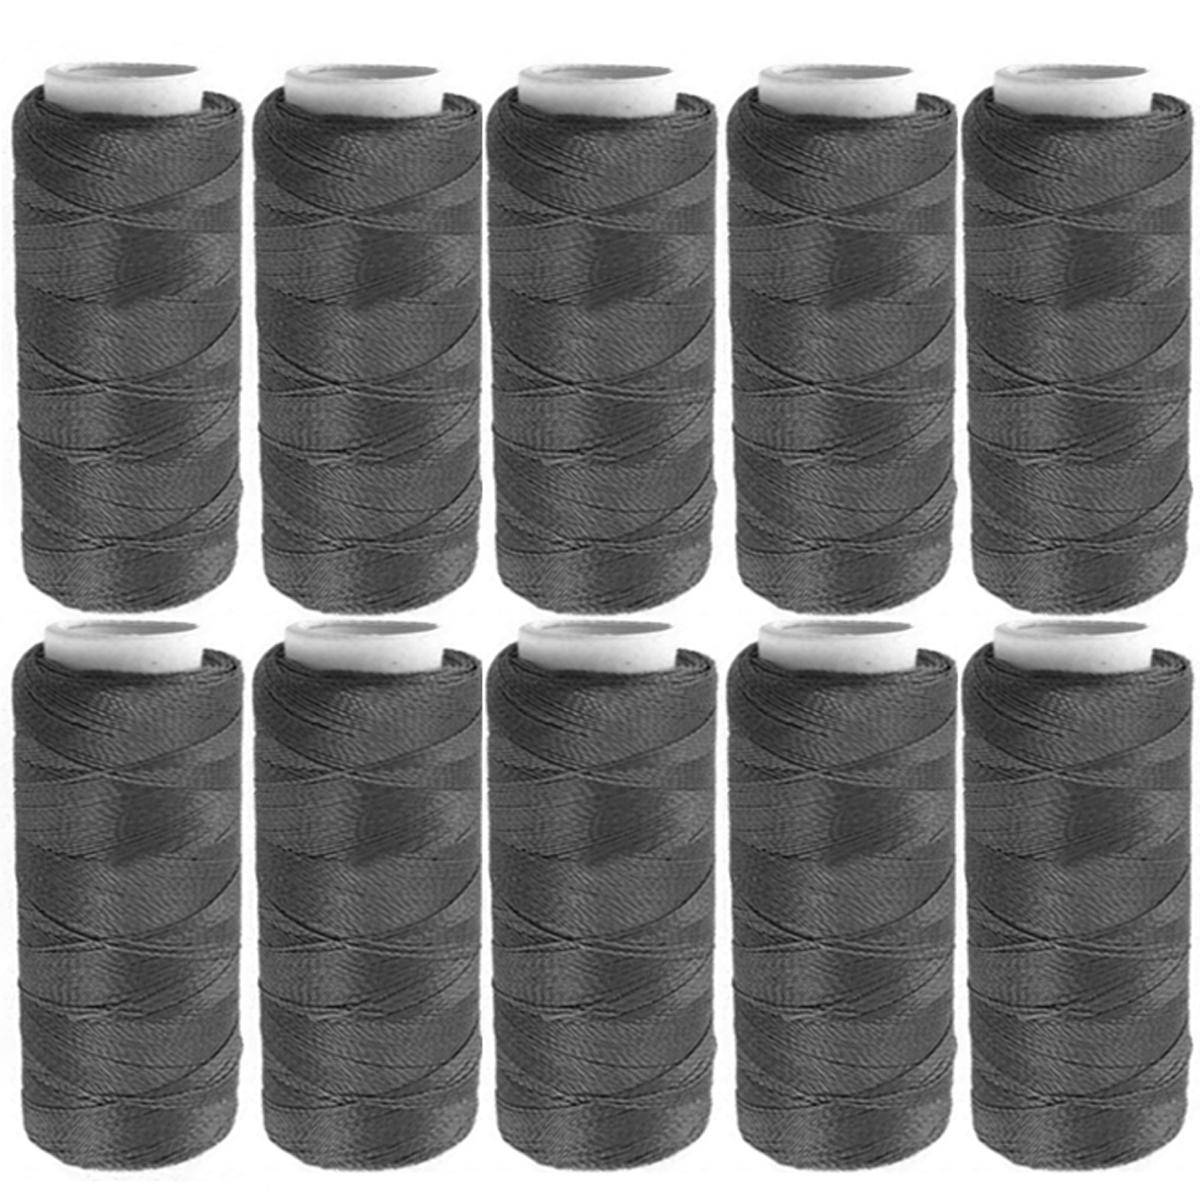 Набор ниток, цвет: темно-серый, 120 м, 10 шт. 675491675491